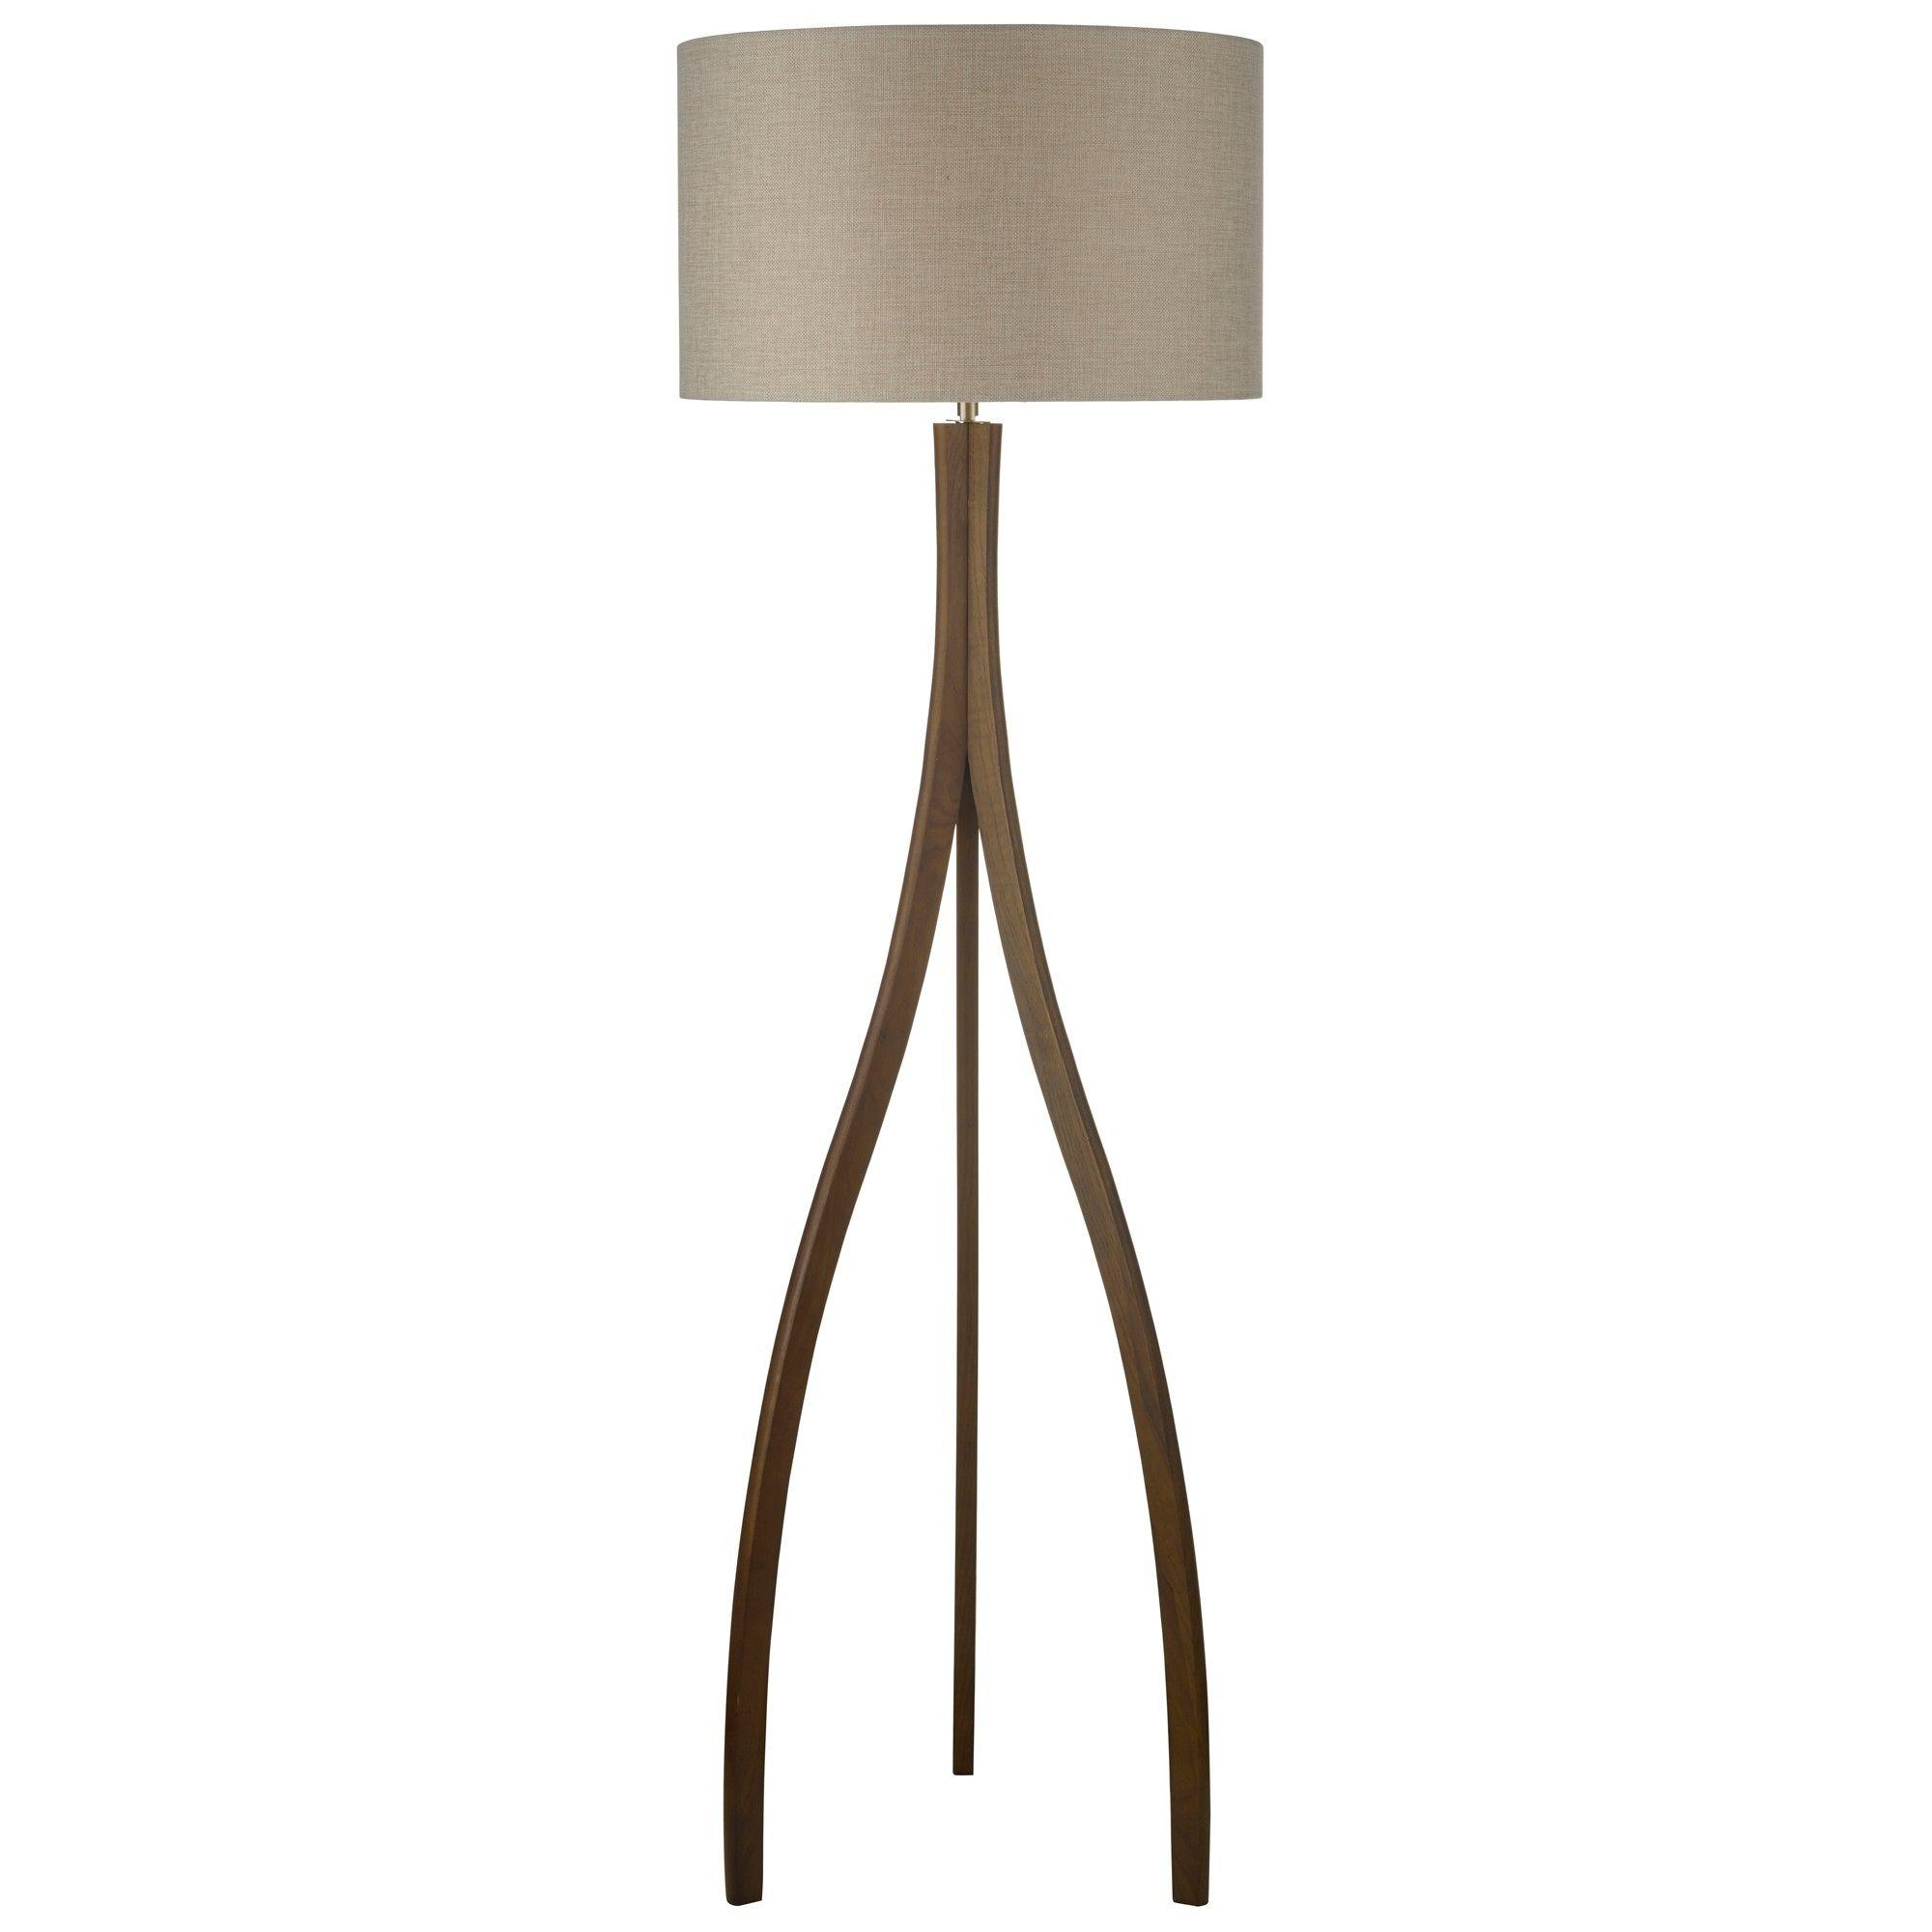 Wooden 'Kade' floor lamp Floor lamp, Lamp, Classic decor